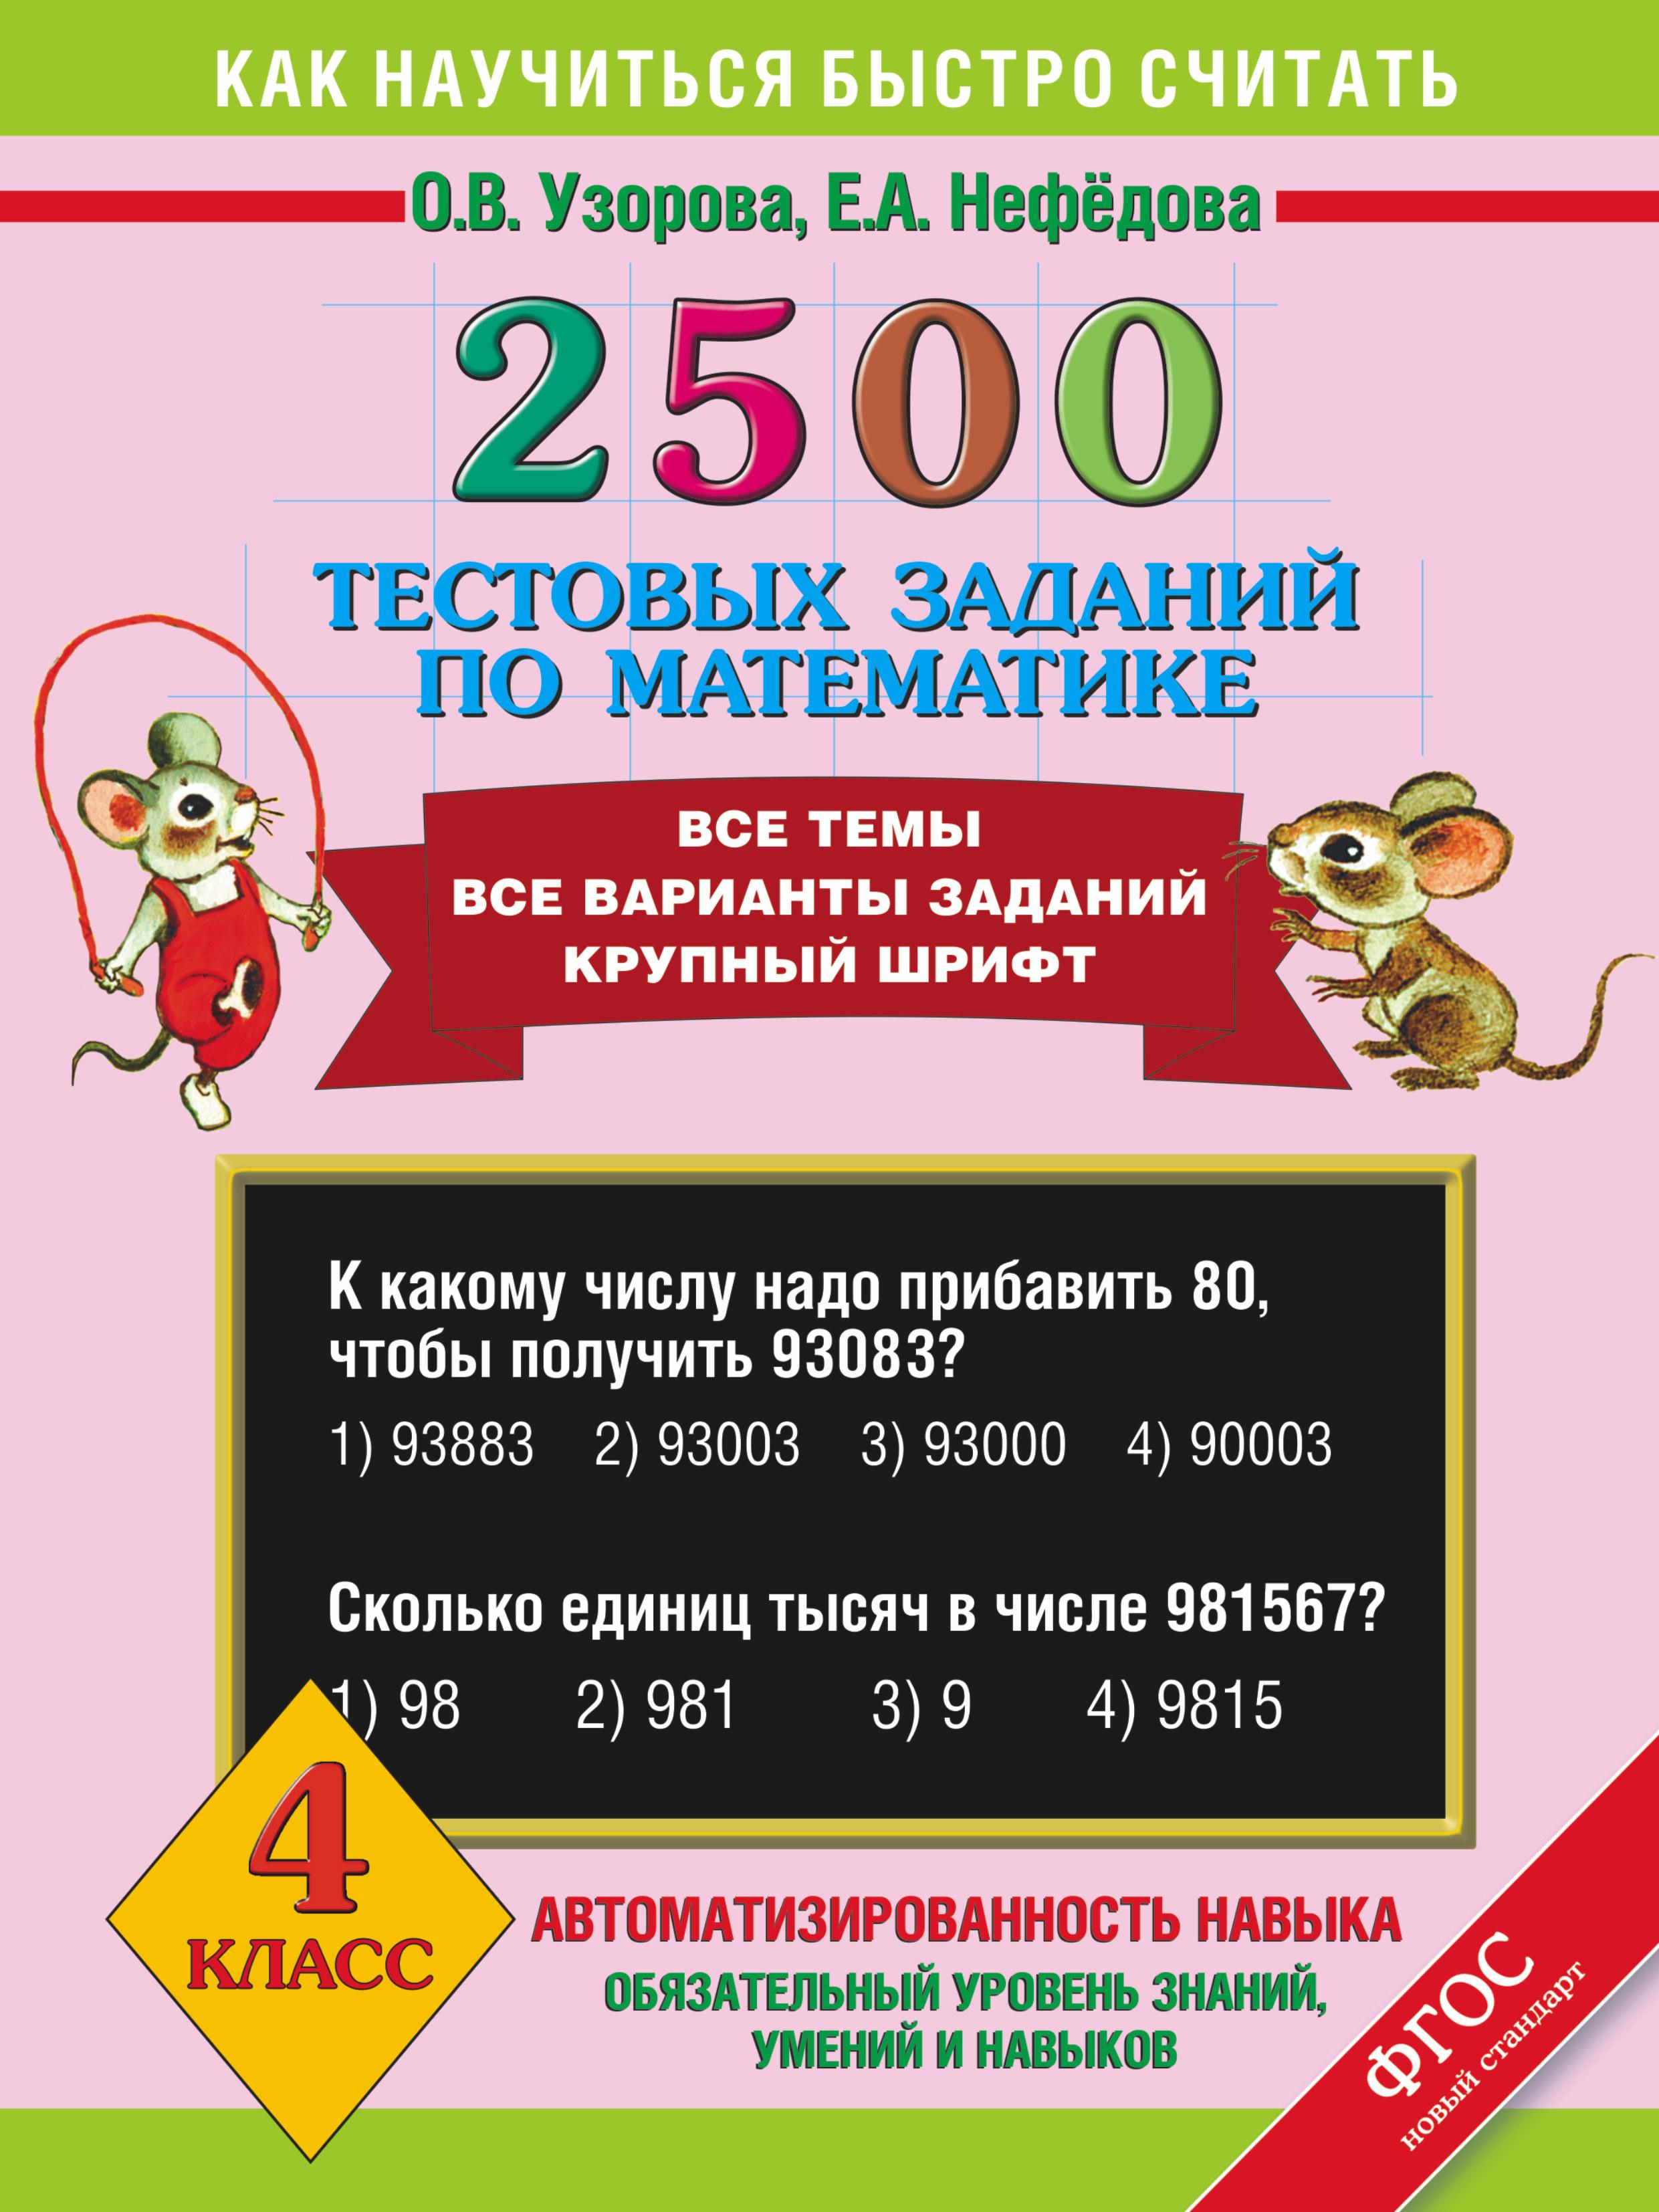 О. В. Узорова, Е. А. Нефёдова Математика. 4 класс. 2500 тестовых заданий